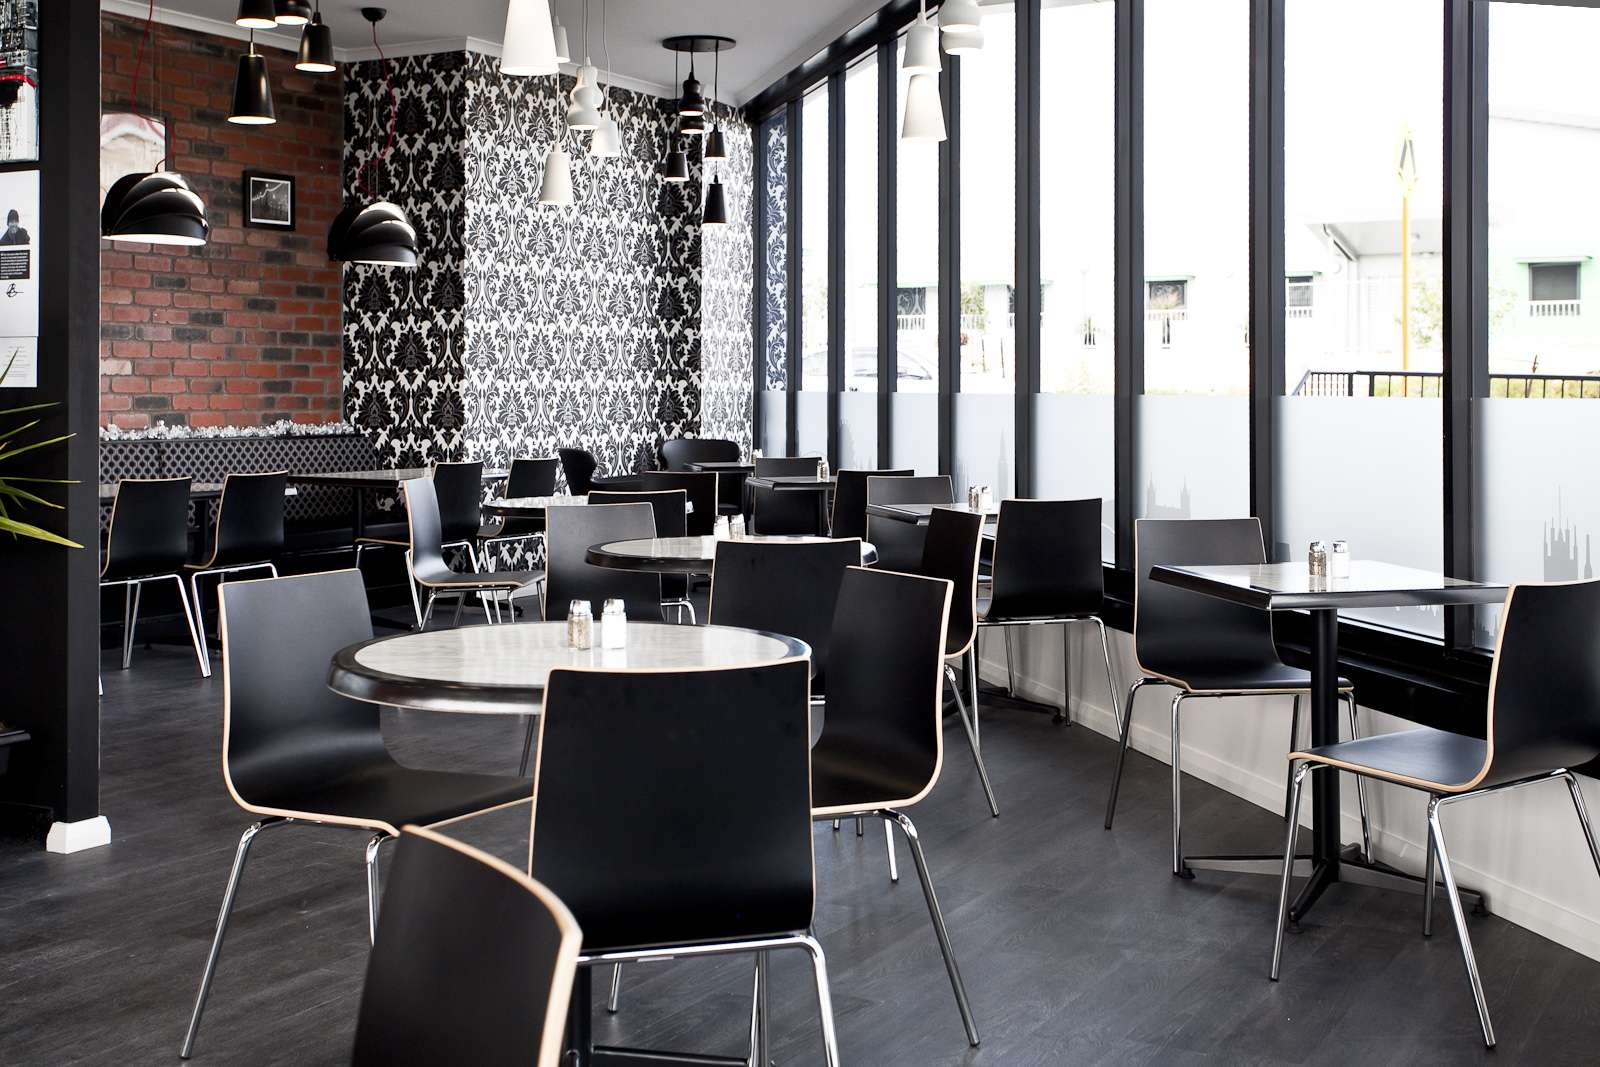 London cafe bar ergoline furniture